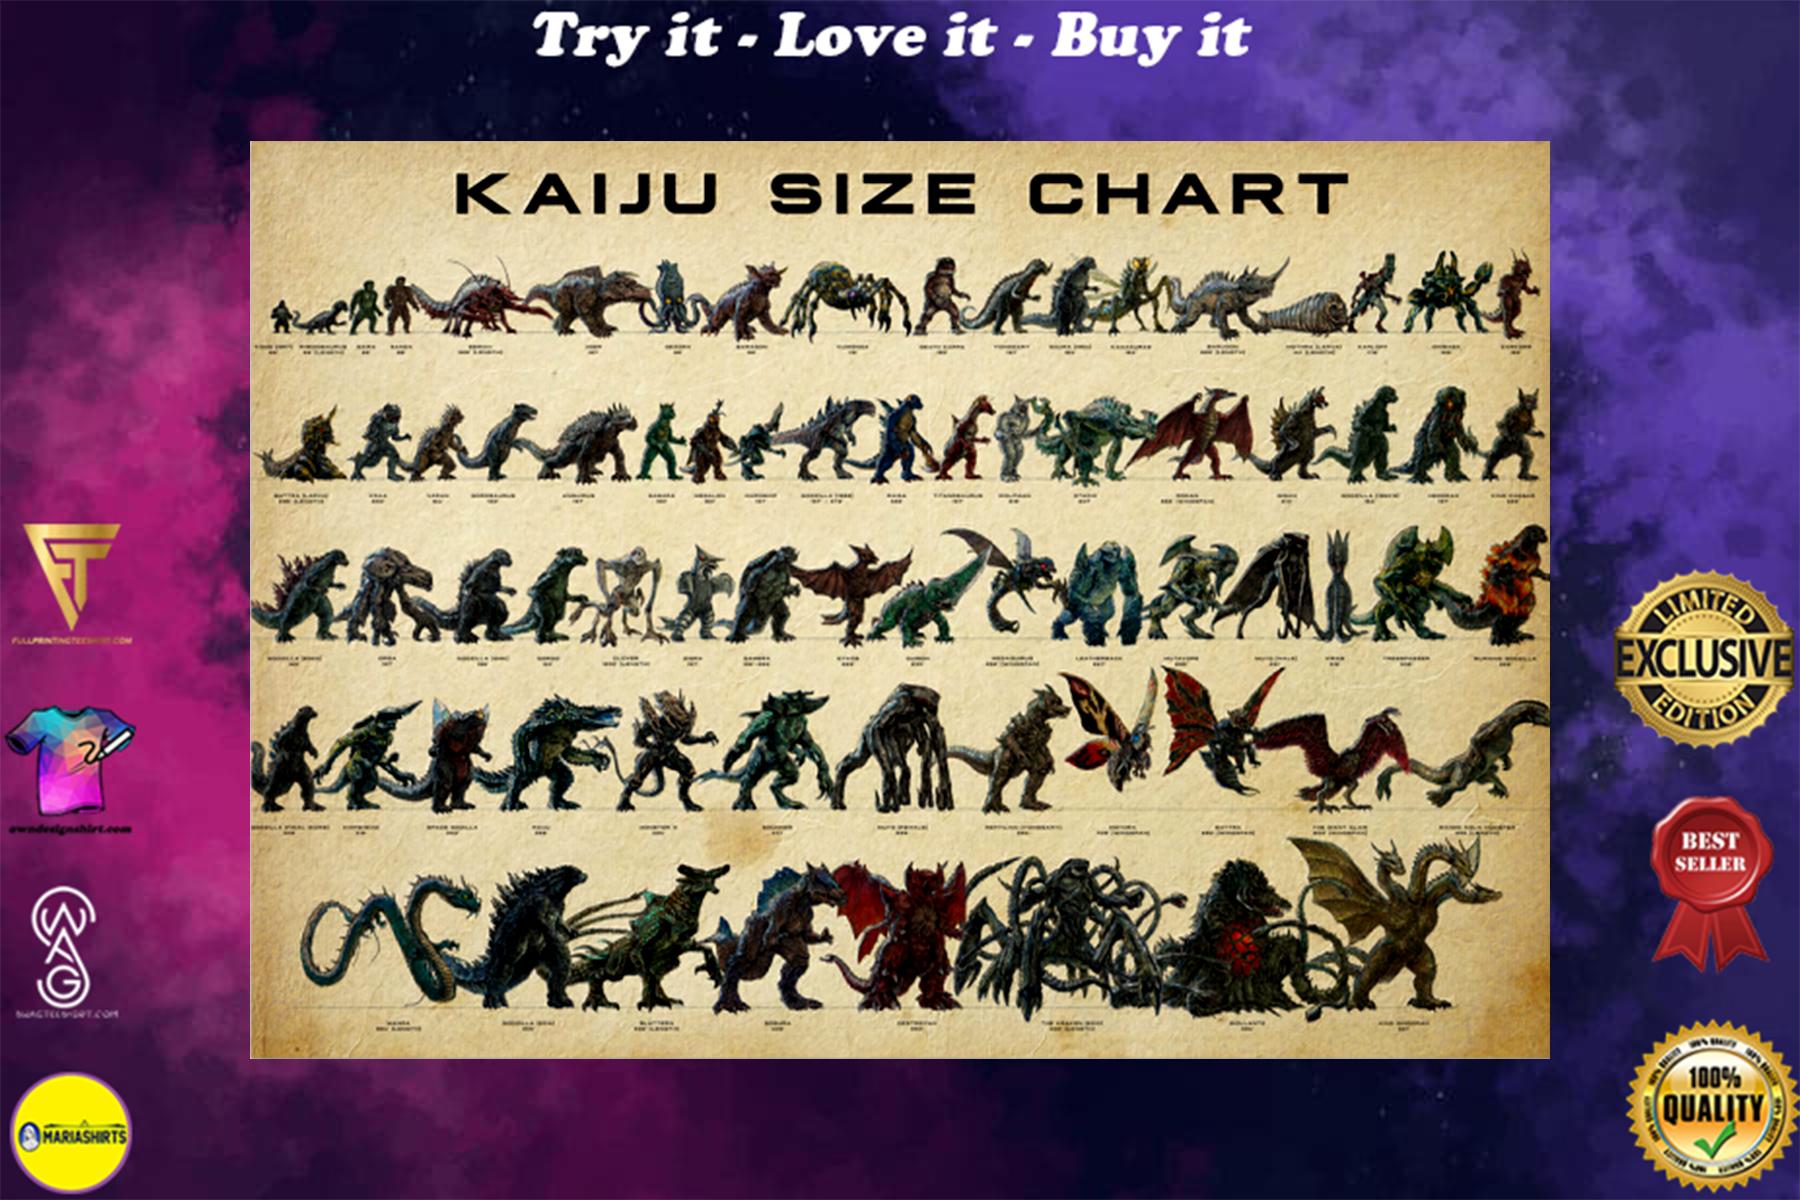 kaiju size chart vintage poster